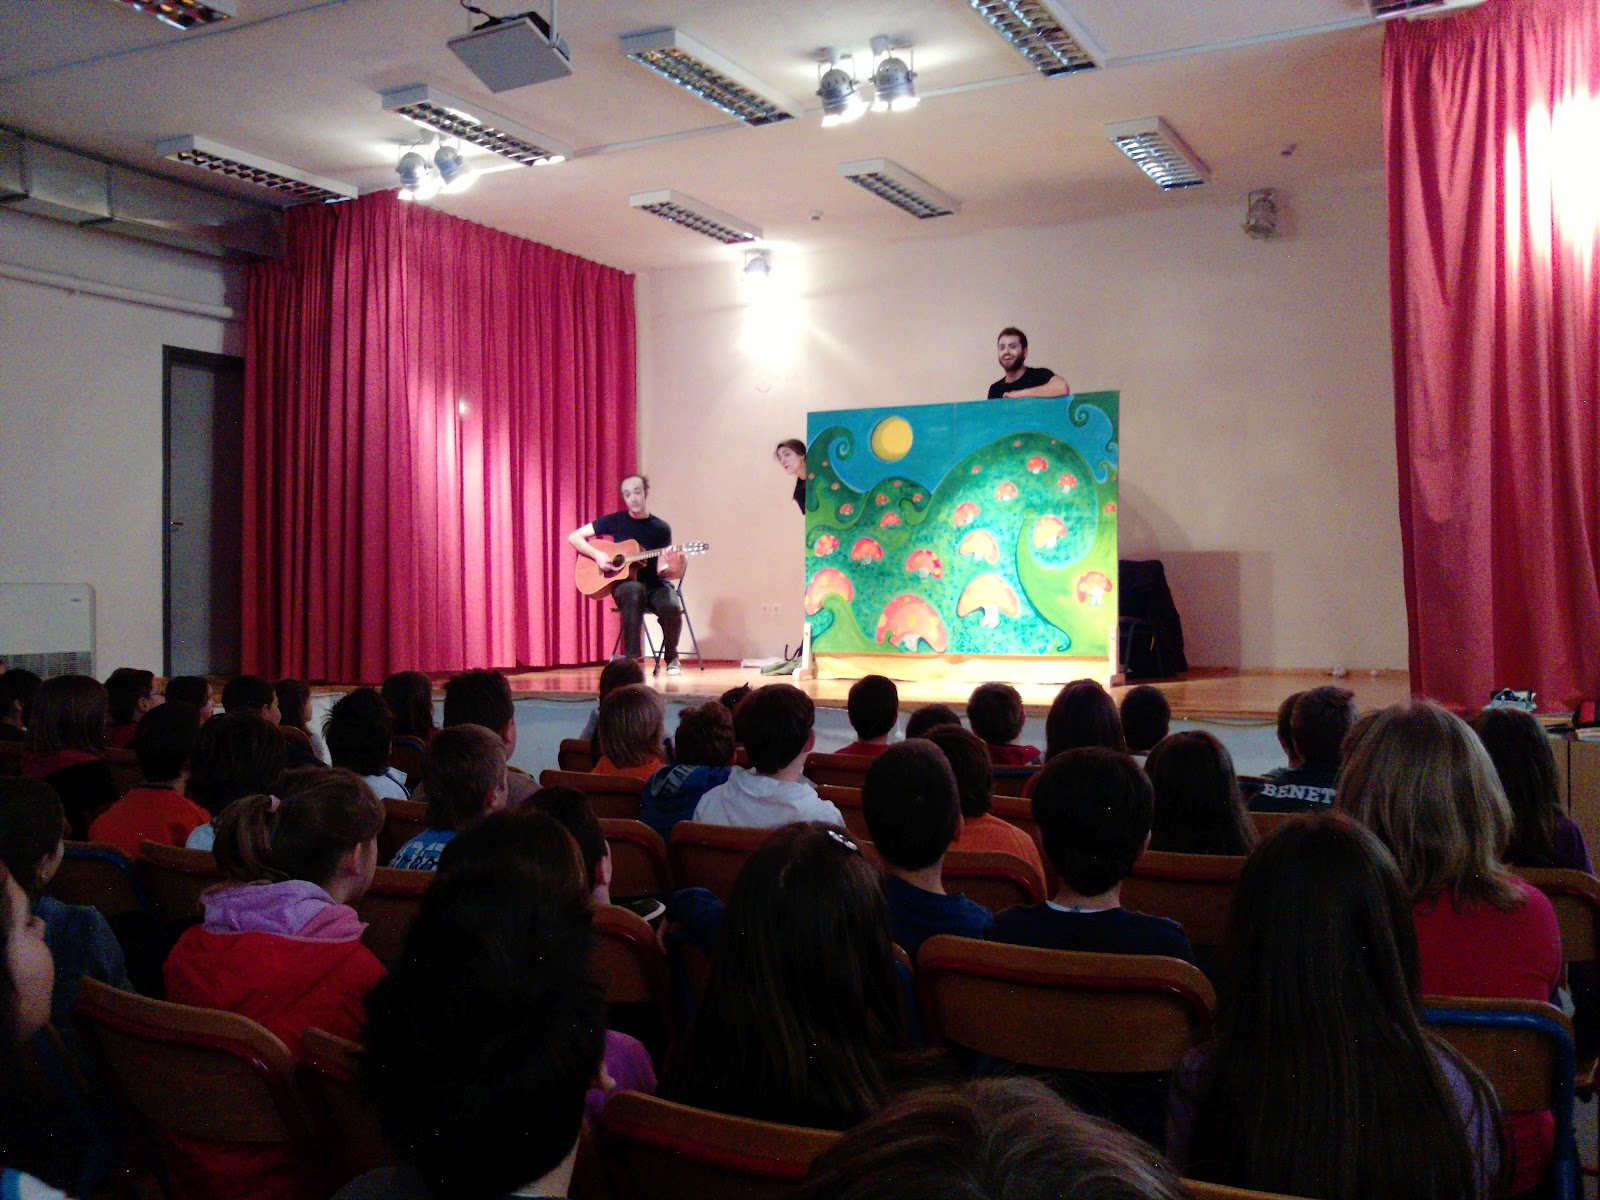 Karmantilos to Diplio Kastorias/ Ο Καρμάντηλος στο Δισπηλιό Καστοριάς